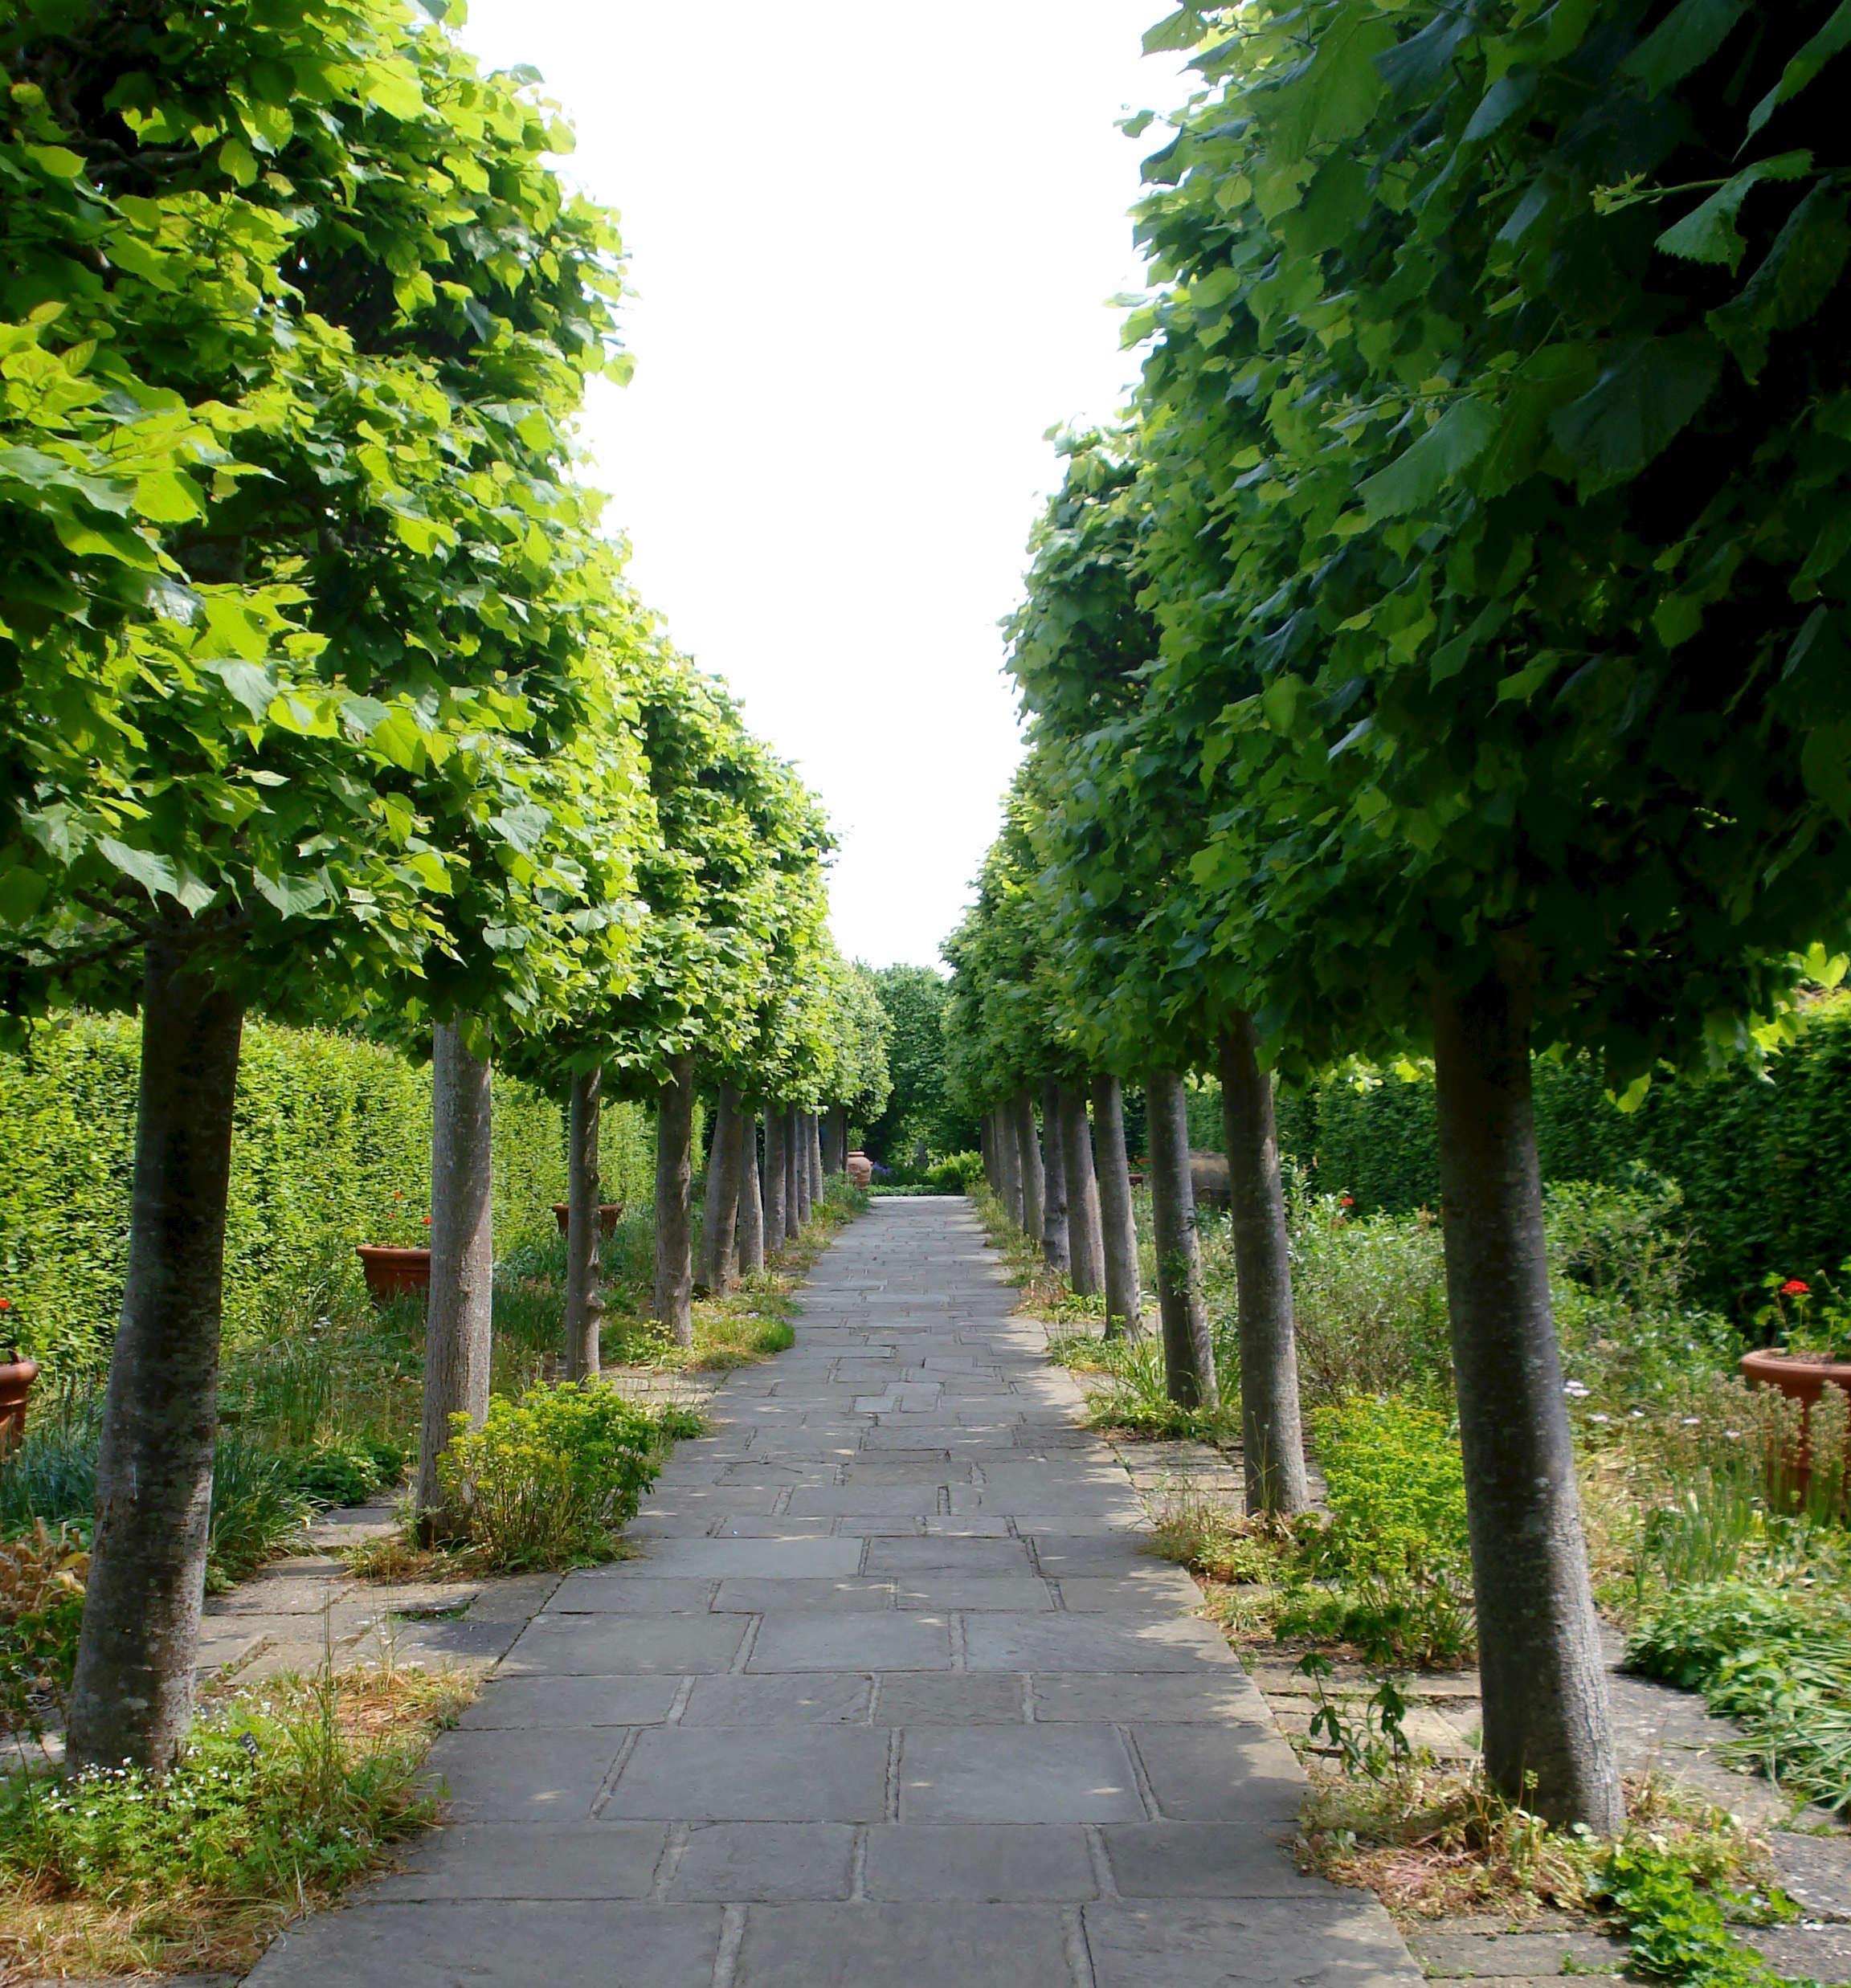 sissinghurst-lime-walk-pleached-trees-phil-bartle-flickr